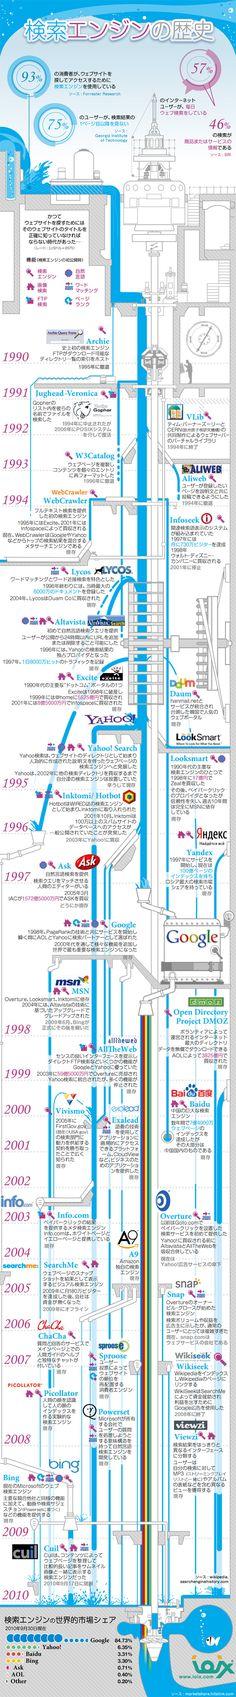 Release: 2010/11/8 検索エンジンの歴史 googleやyahoo!などの検索エンジンは現在日々の情報ツールとして欠かせないものになっていますが、検索エンジン自体の歴史は実は20年程度しかありません。このインフォグラフィックでは、検索エンジンがここまで生活に必須の...